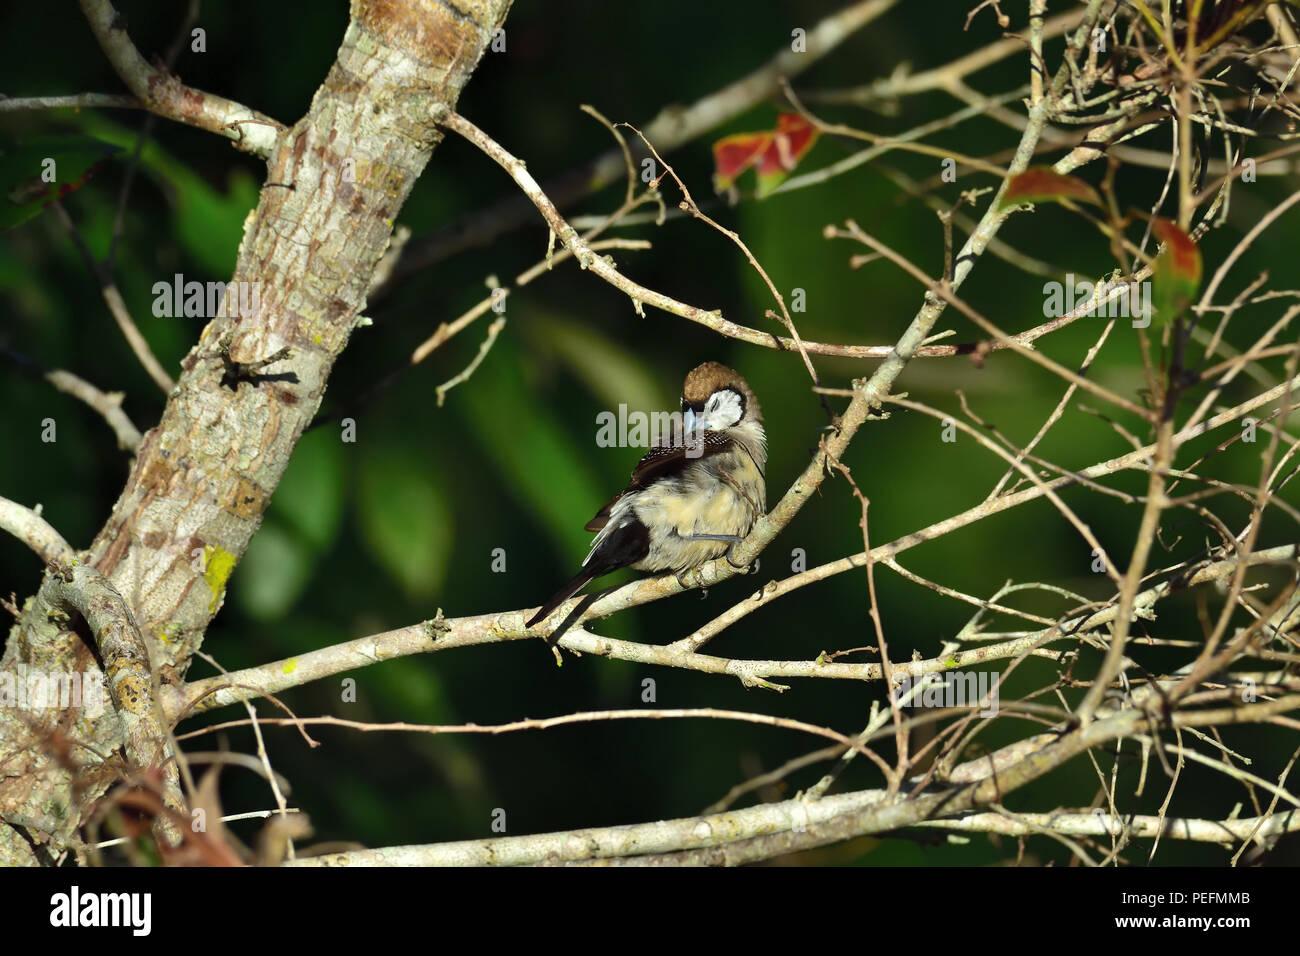 An Australian, Queensland Double-barred Finch ( Taeniopygia bichenovii ) perched on a tree branch preening itself - Stock Image